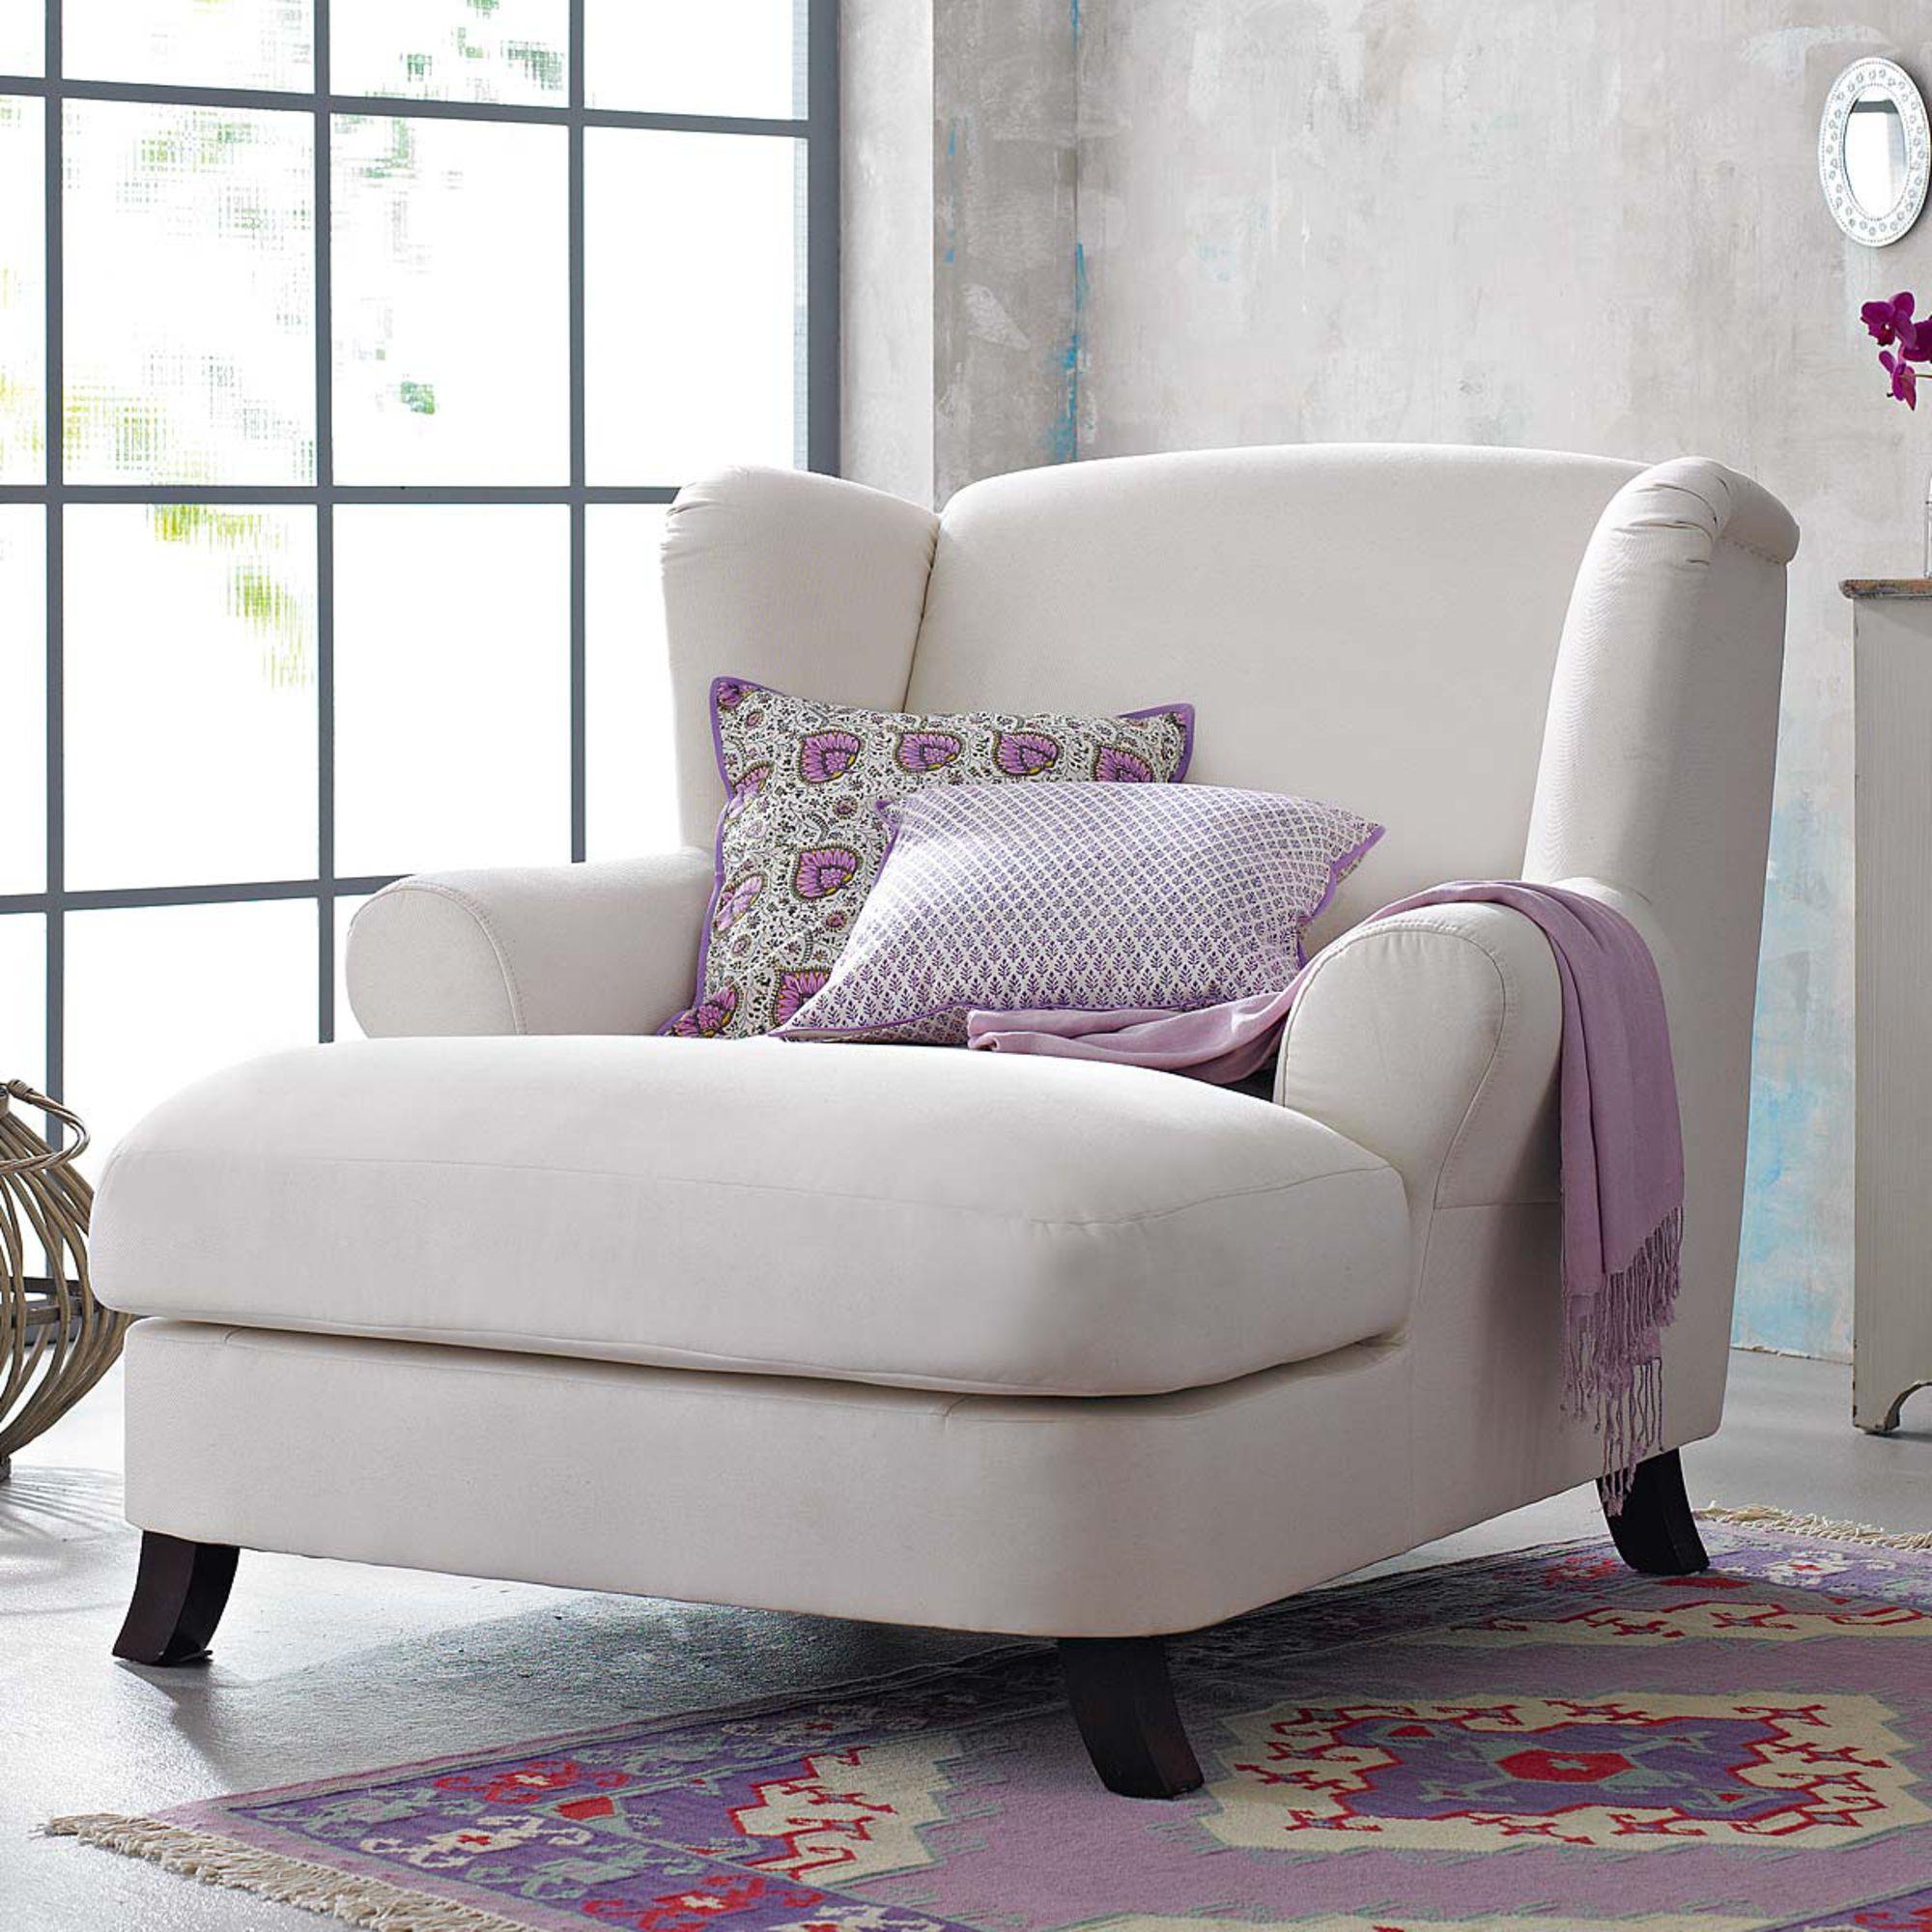 gro er gem tlicher ohrensessel living impressionen wohnen pinterest ohrensessel. Black Bedroom Furniture Sets. Home Design Ideas